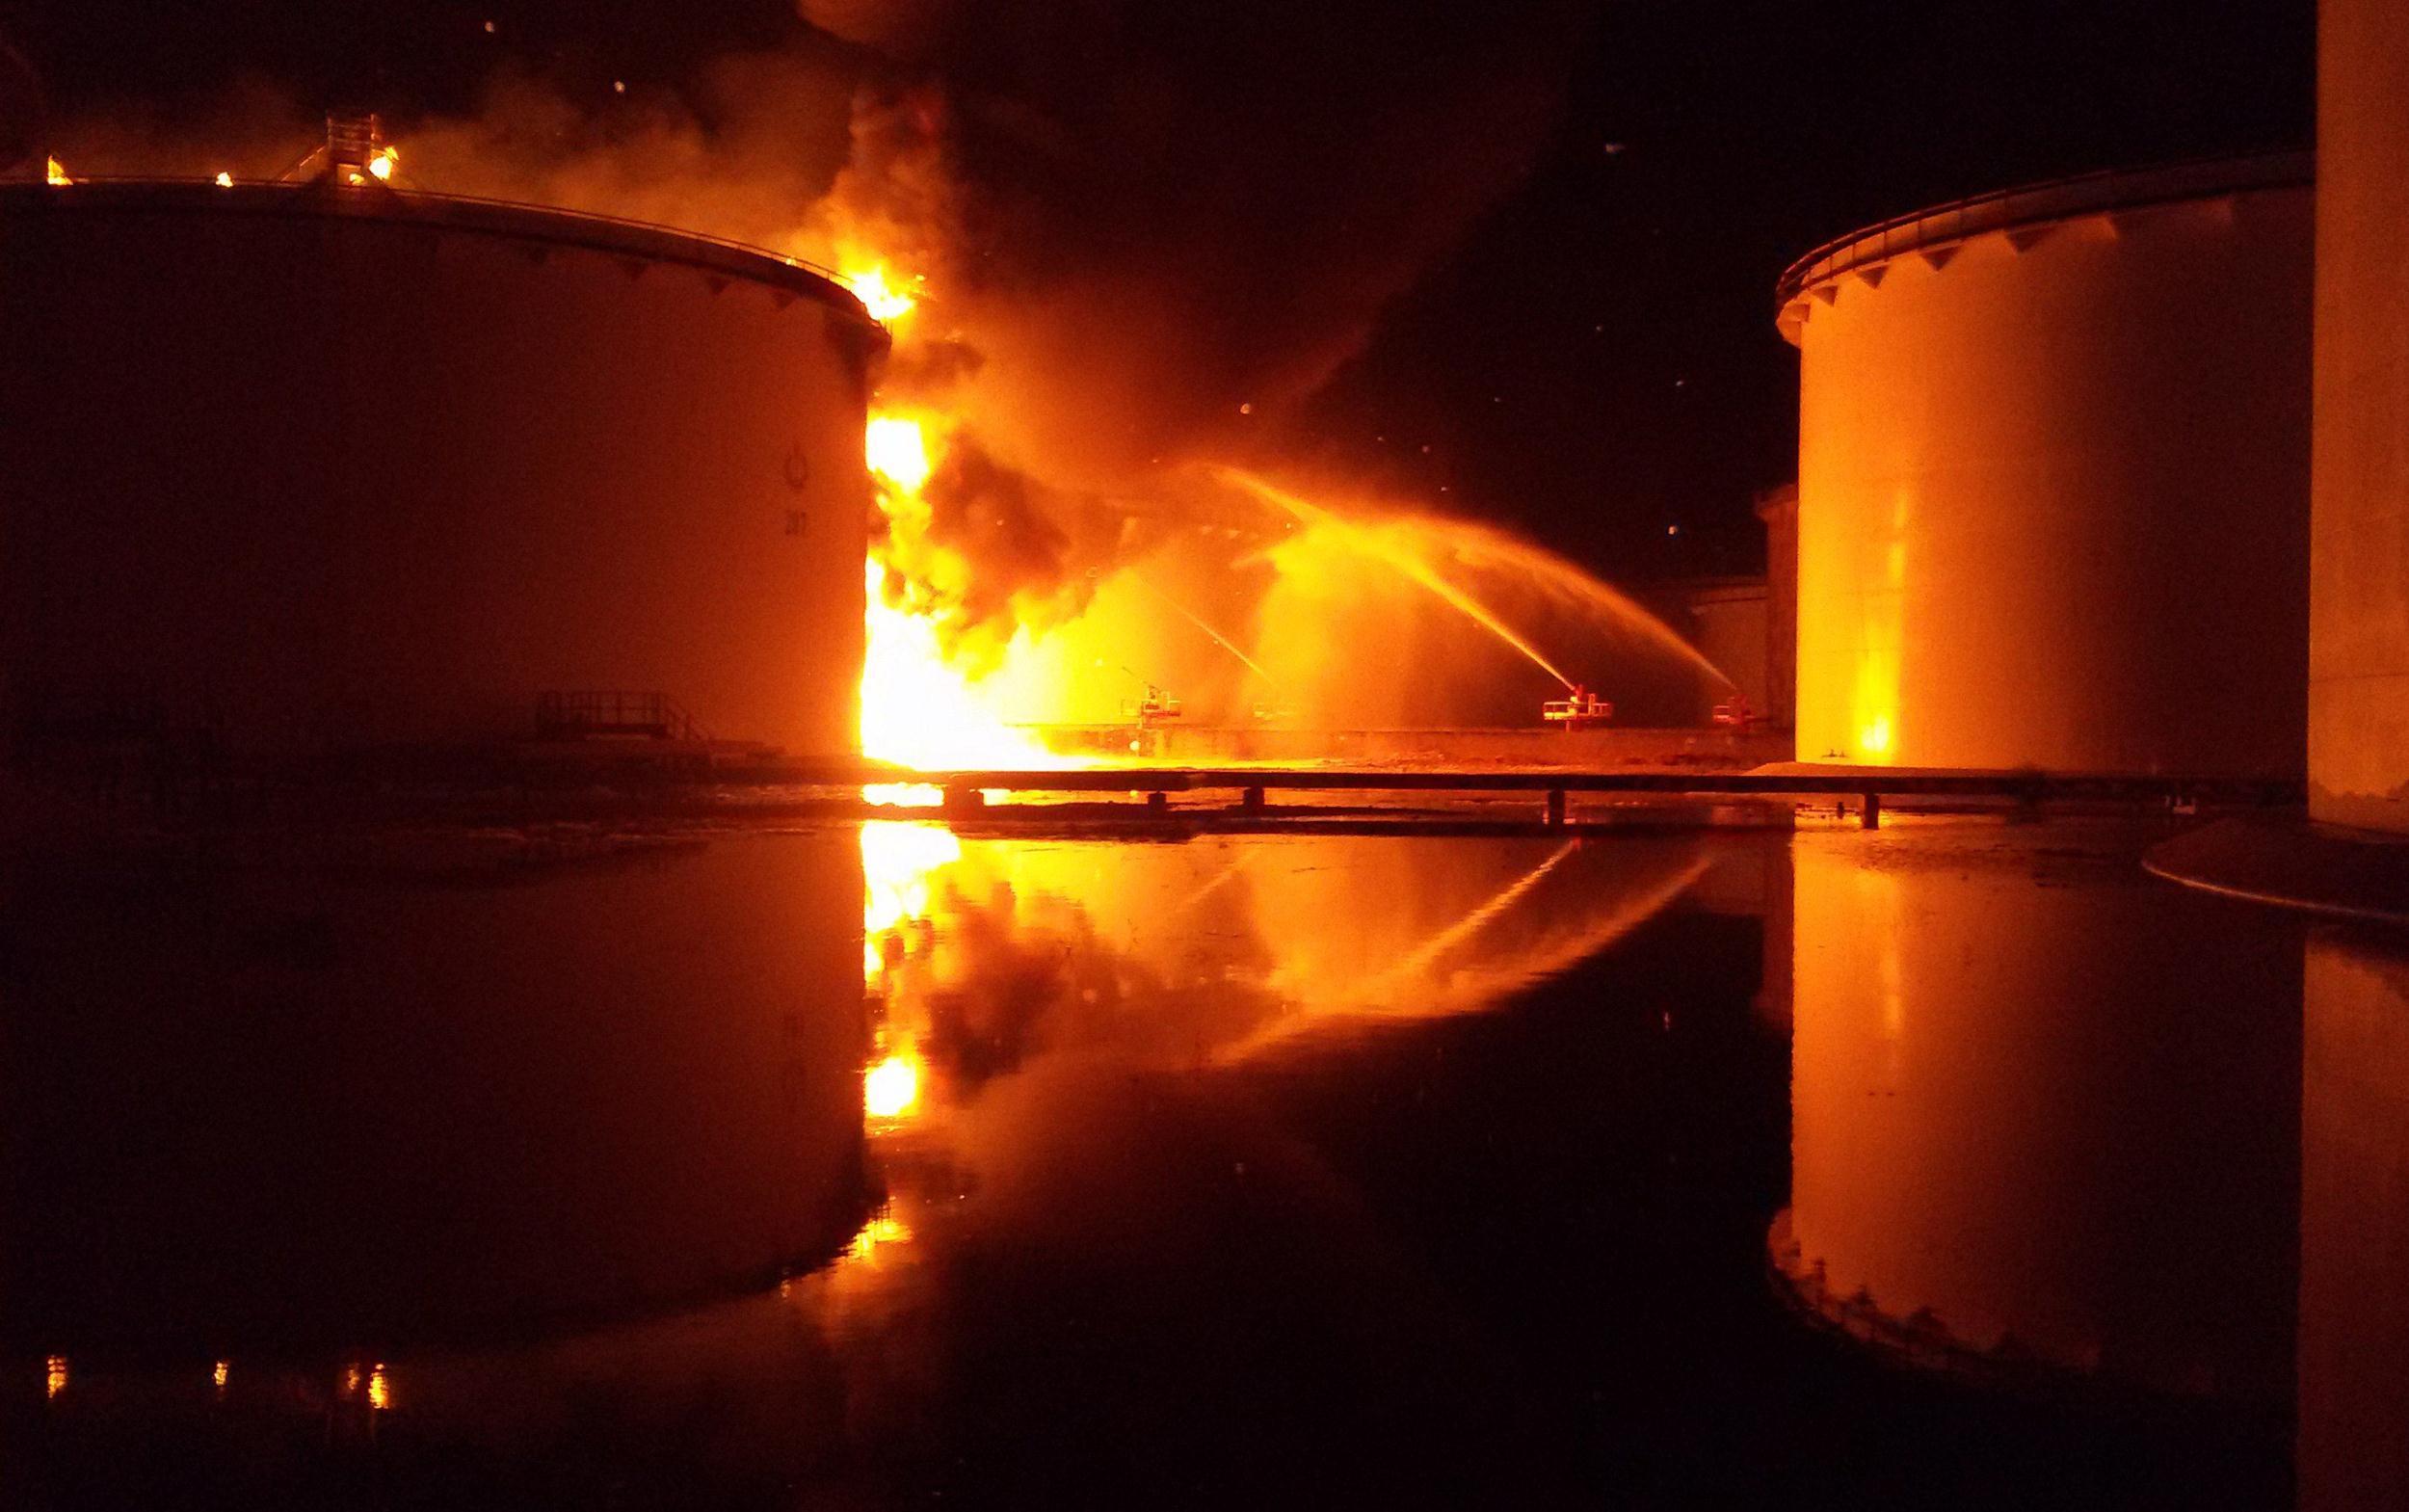 Image: Libyan firefighters dousing a huge blaze at an oil tank